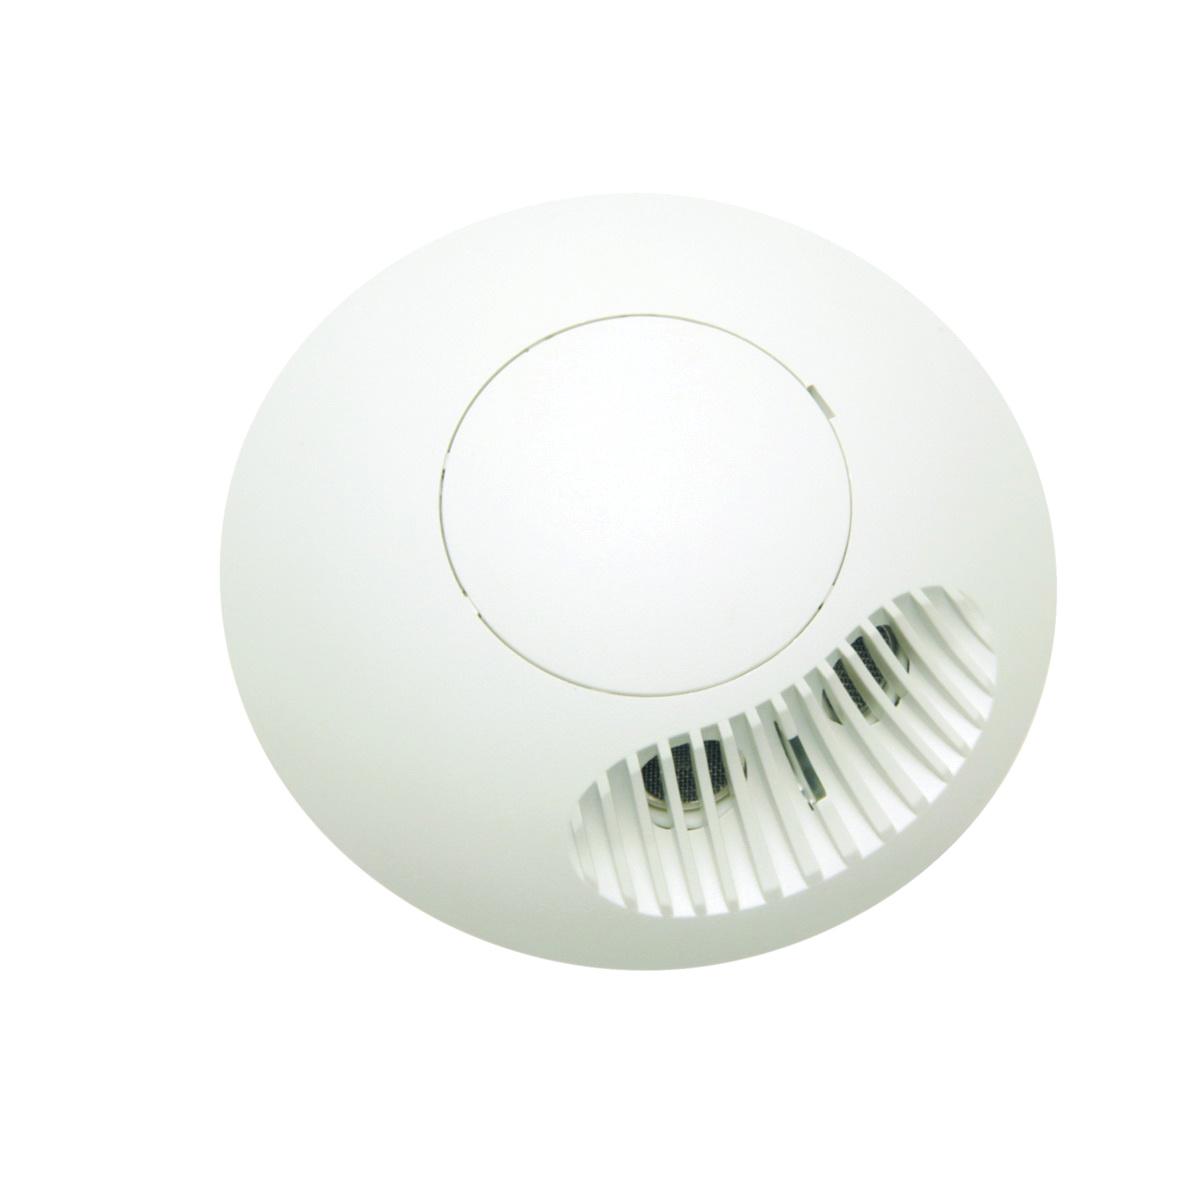 Hubbell Wiring Omnius2000 Ultrasonic Vacancy Occupancy Sensor 2000 Systems Sq Ft 24 Volt Dc